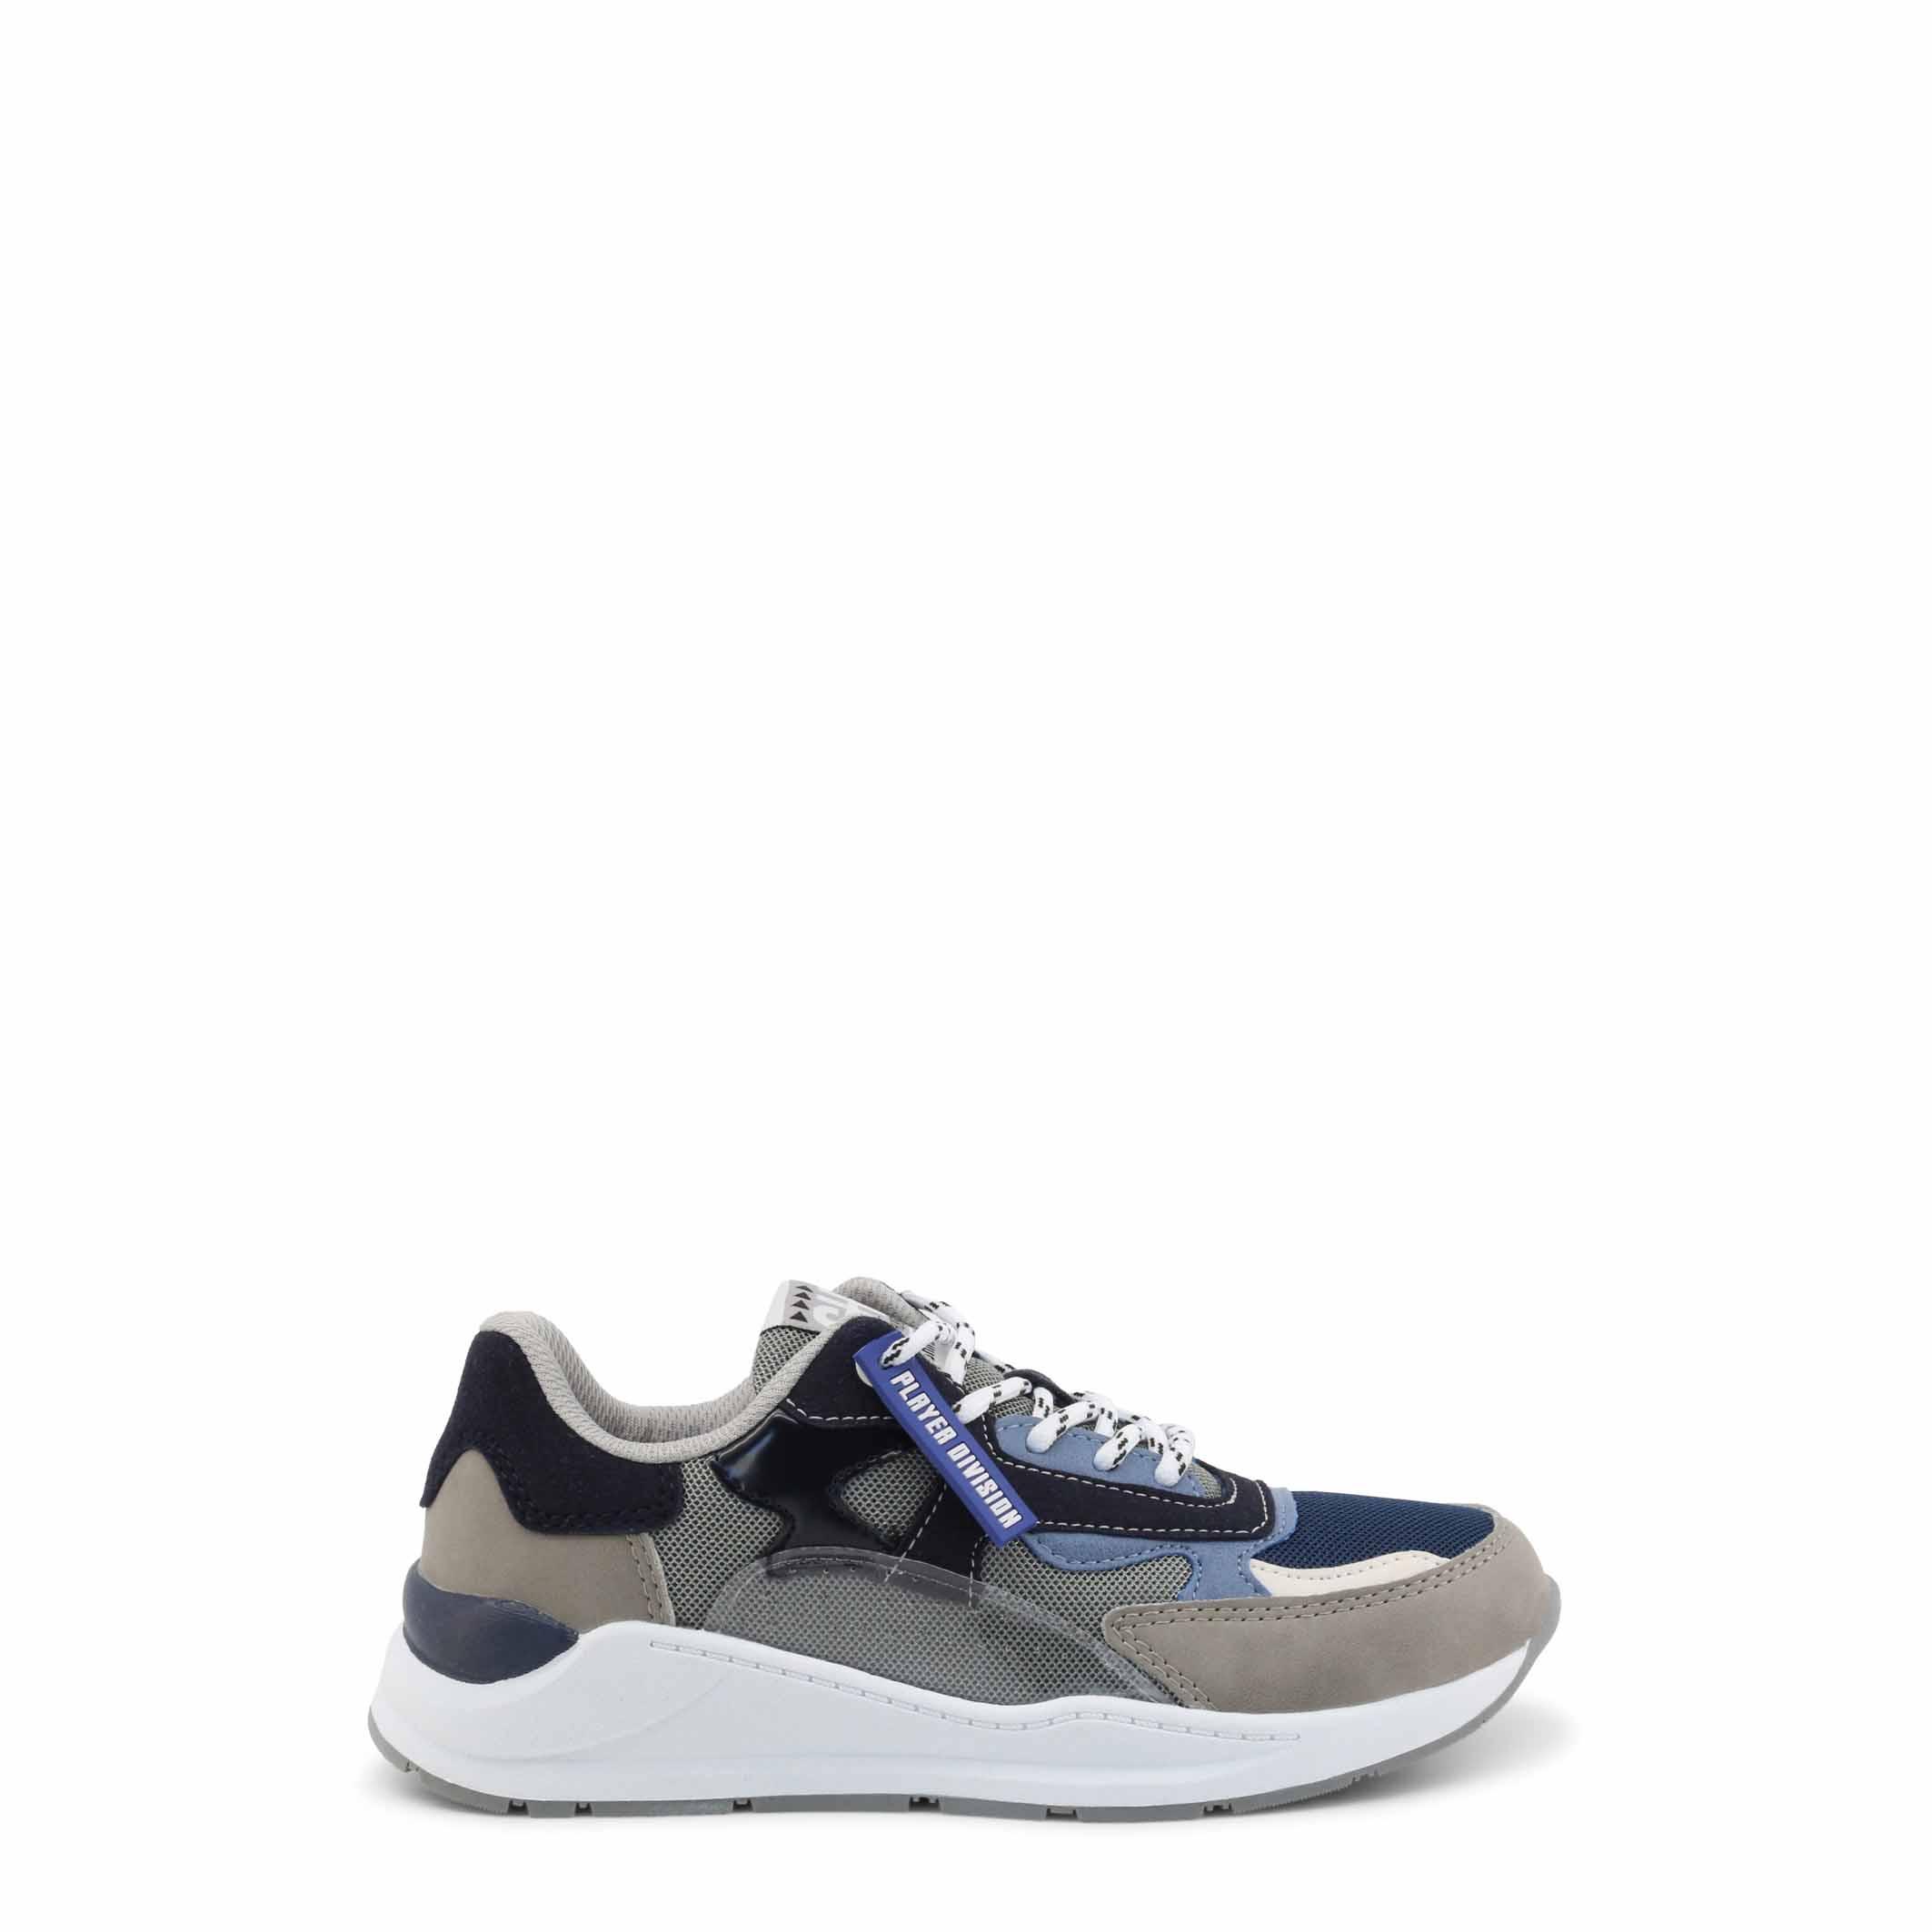 Shone - 3526-012 - Grey